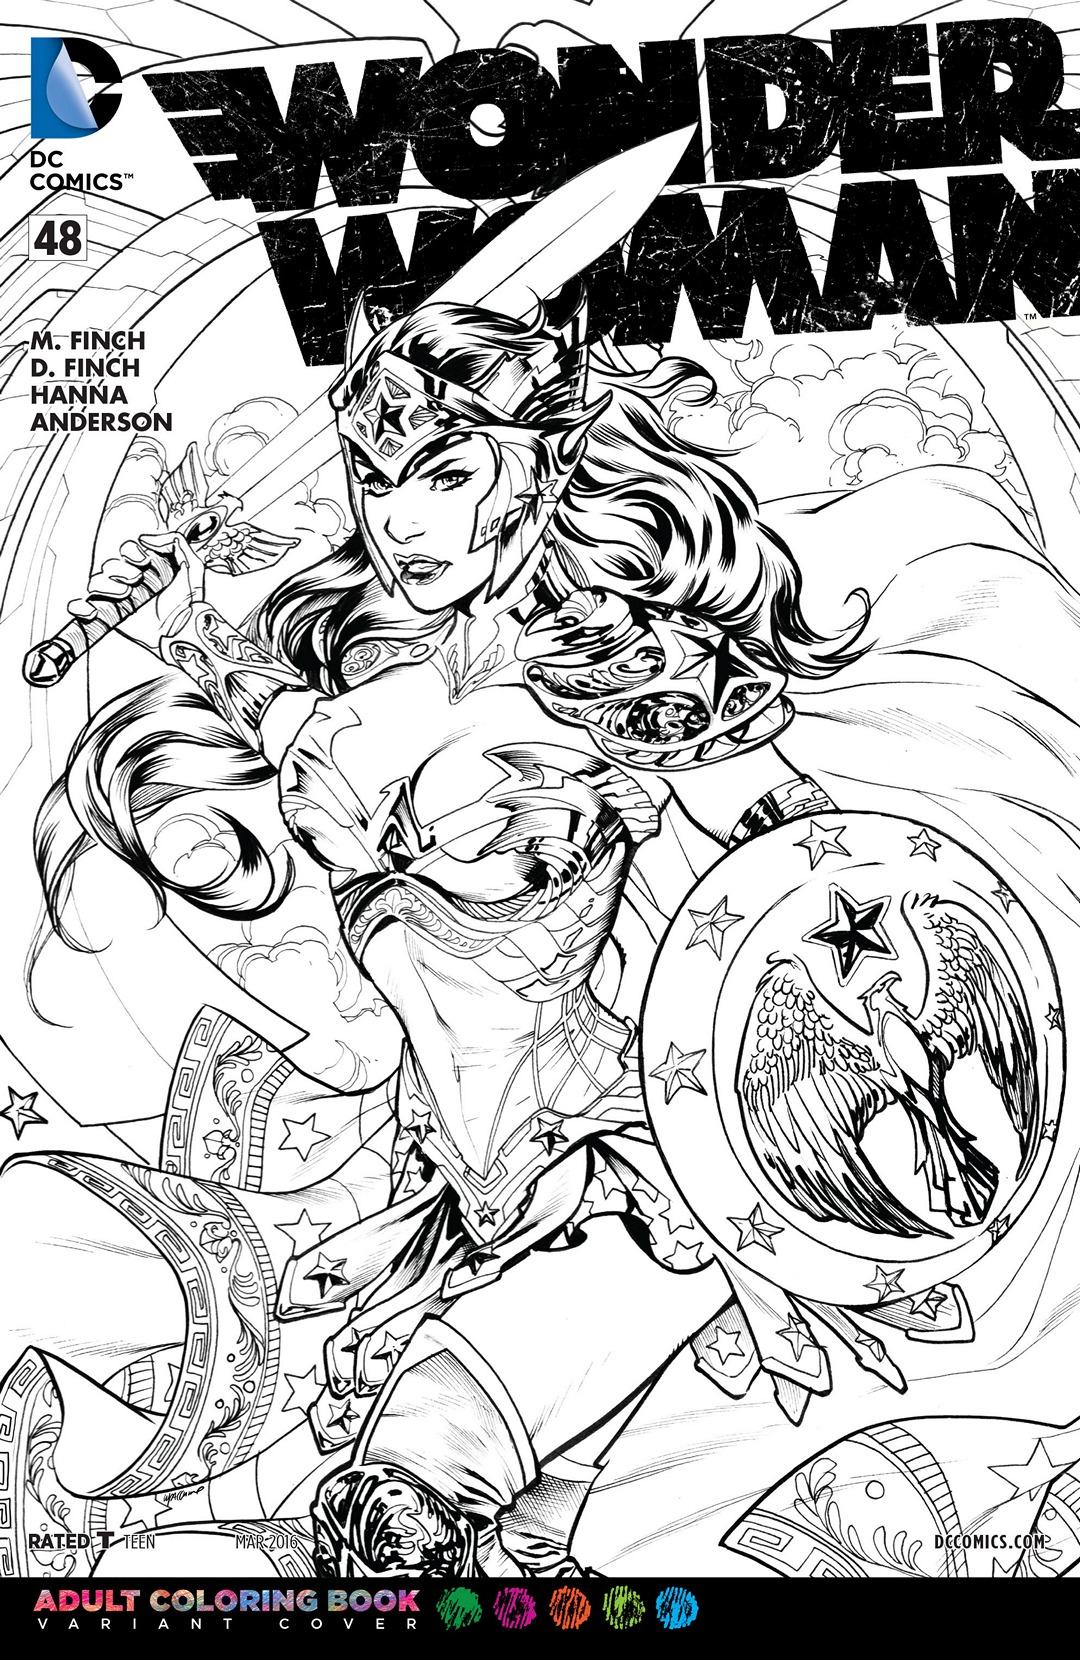 Coloring pages wonder woman - File Wonder Woman Vol 4 48 Adult Coloring Book Variant Jpg